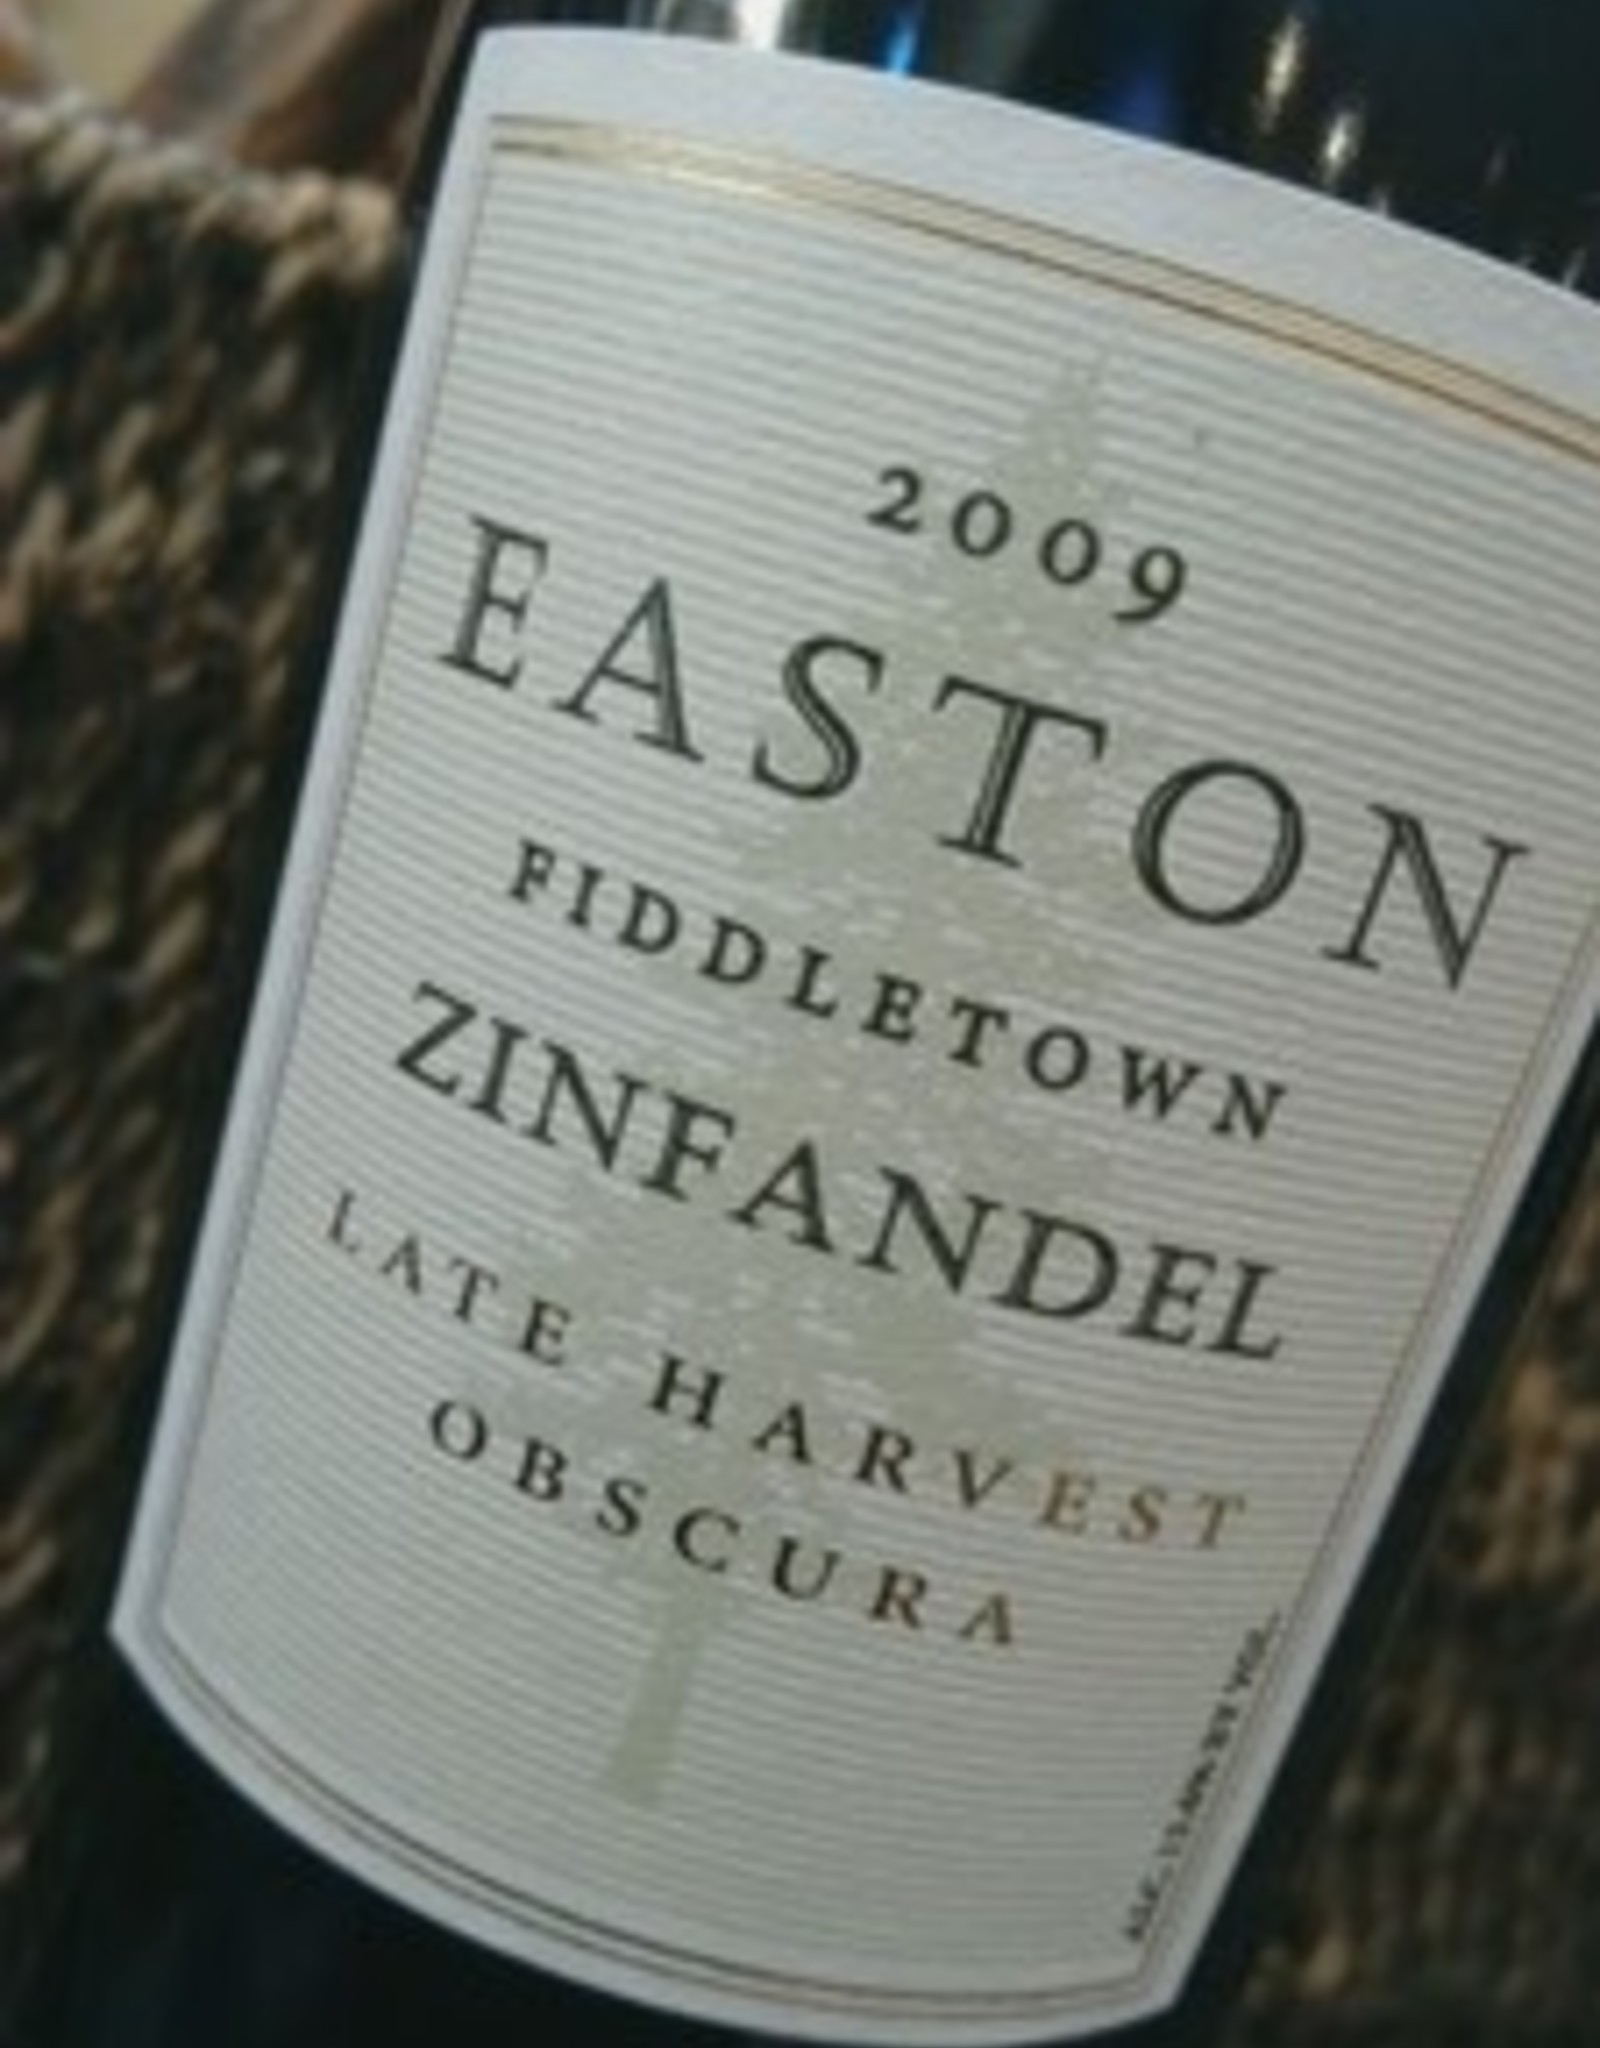 Easton Fiddletown Very Late Harvest Zinfandel Obscura 375ml